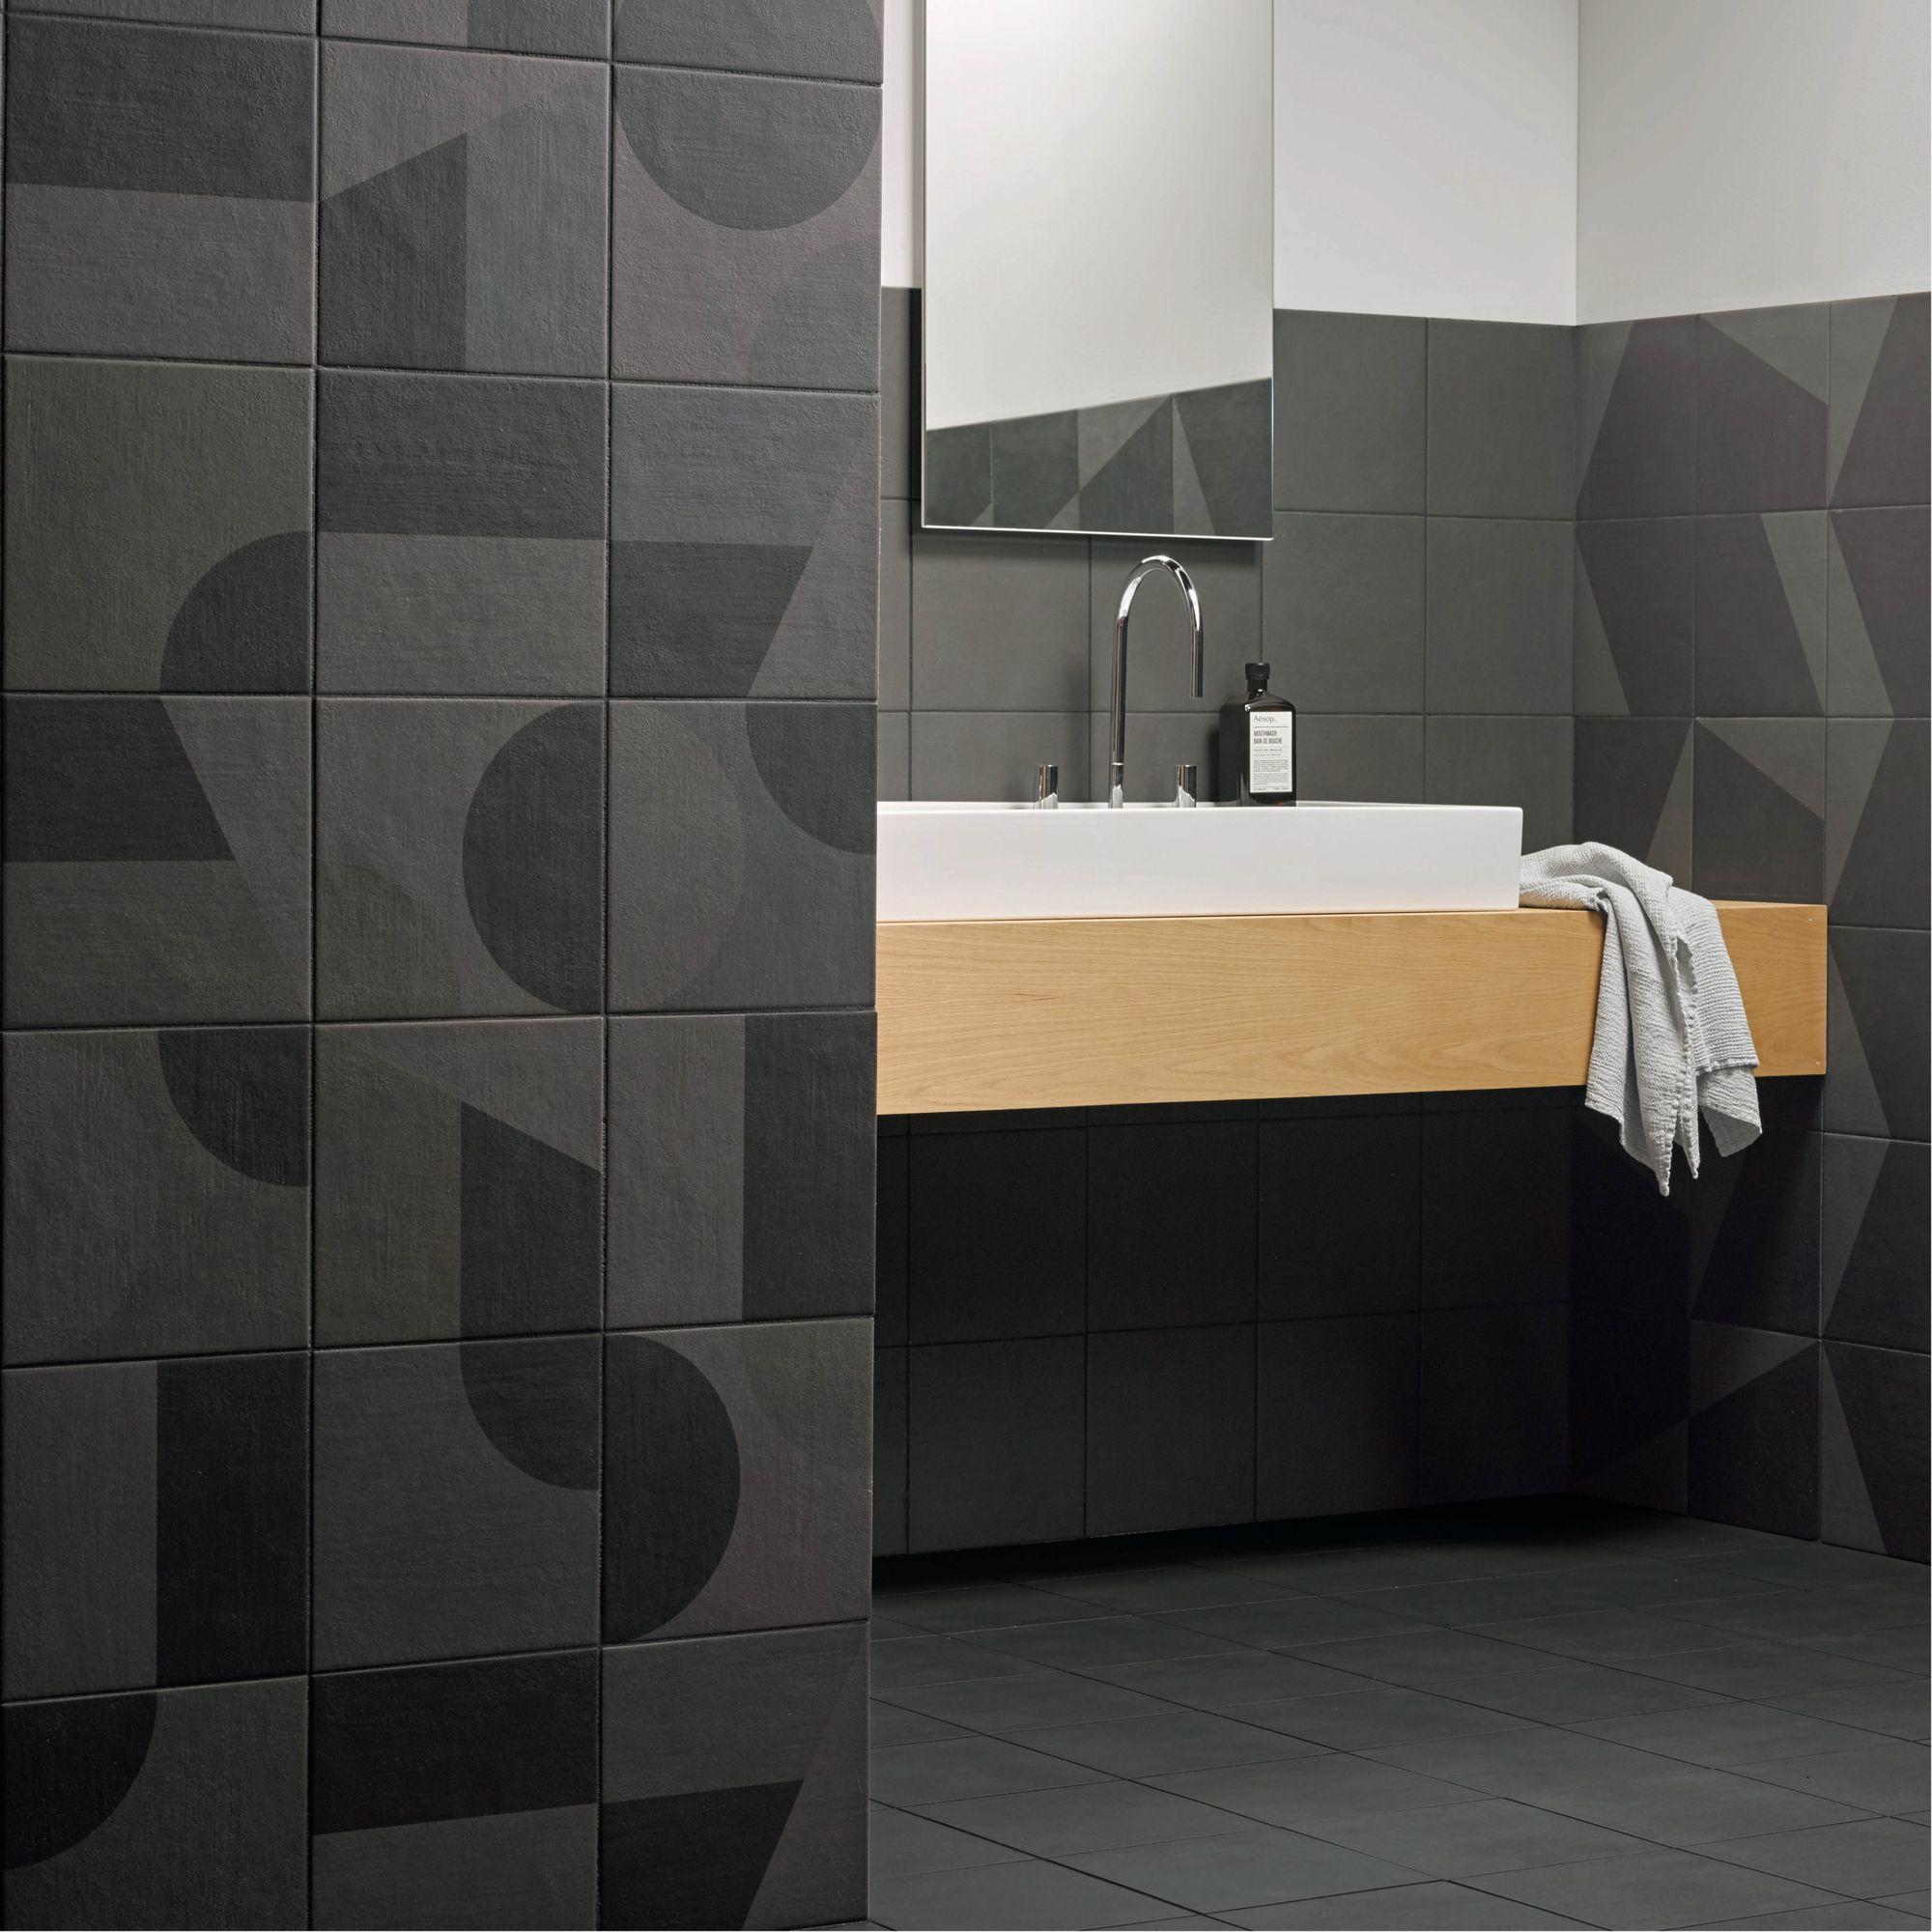 "MUTINA PUZZLE PORCELAIN  ""Good design is all about making other designers feel like idiots because that idea wasn't theirs."" — FRANK CHIMERO . . #tile #tiles #porcelain #TileStyle #tiledesign #subwaytile #walltile #backsplash #flooring#luxurydesign #LuxuryMarble #Marble #granitecountertops #marblefloors #quartzite #luxurydecor #luxuryhomes #marbledesign#InteriorDesign #interiordesignerlife #InteriorDesigngoals #thewelldressedhouse #interior #interiors #interiordesigner #interior4inspo"